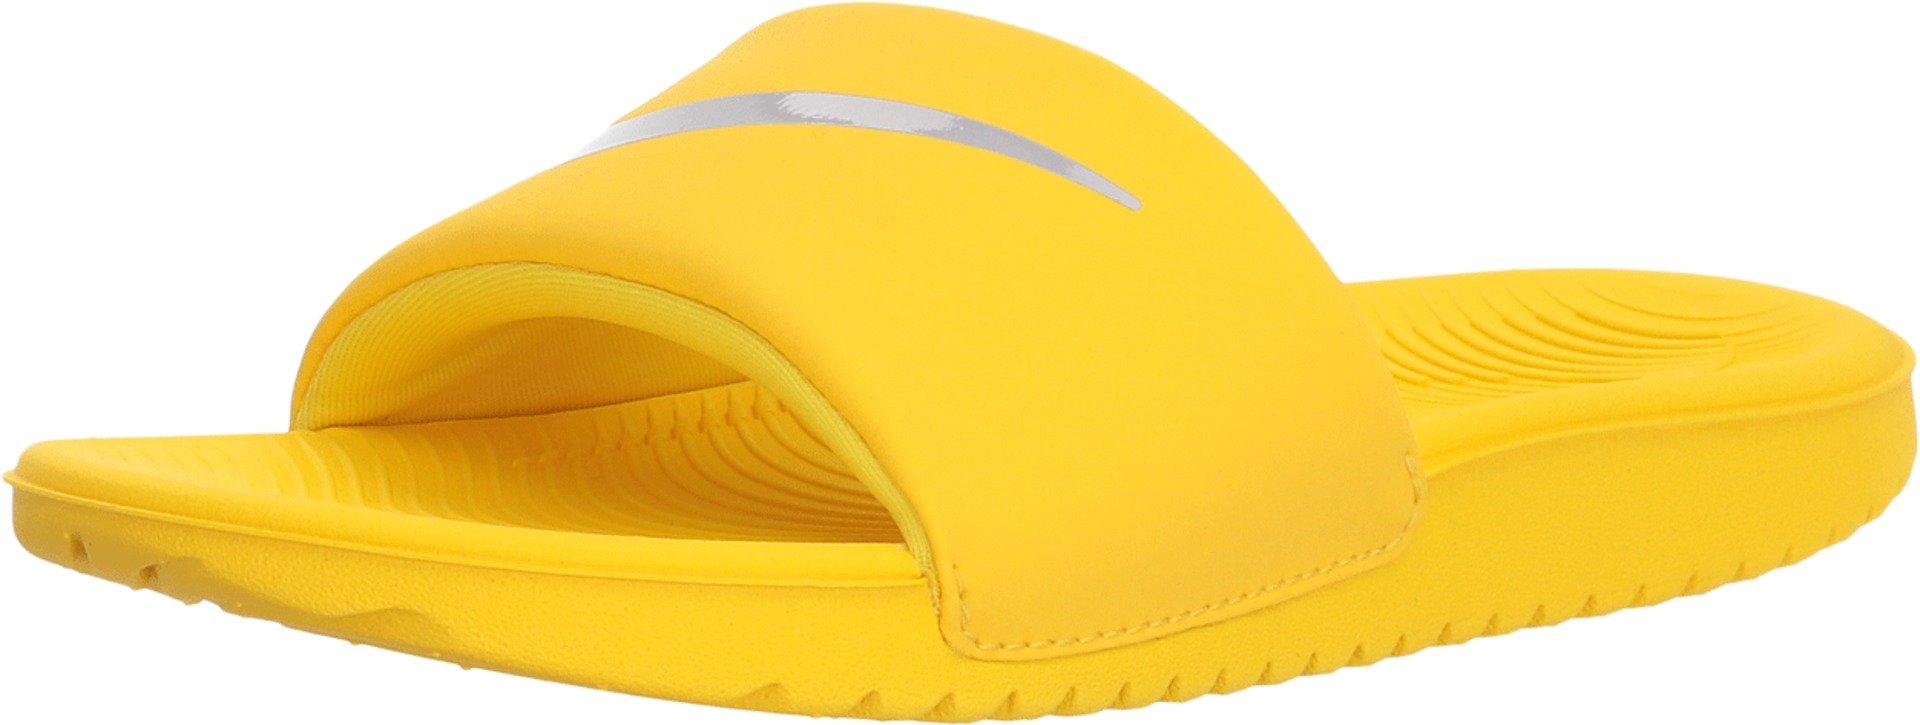 34ca2d491bb01 Galleon - Nike Boys  Kawa Slide (GS PS) Athletic Sandal